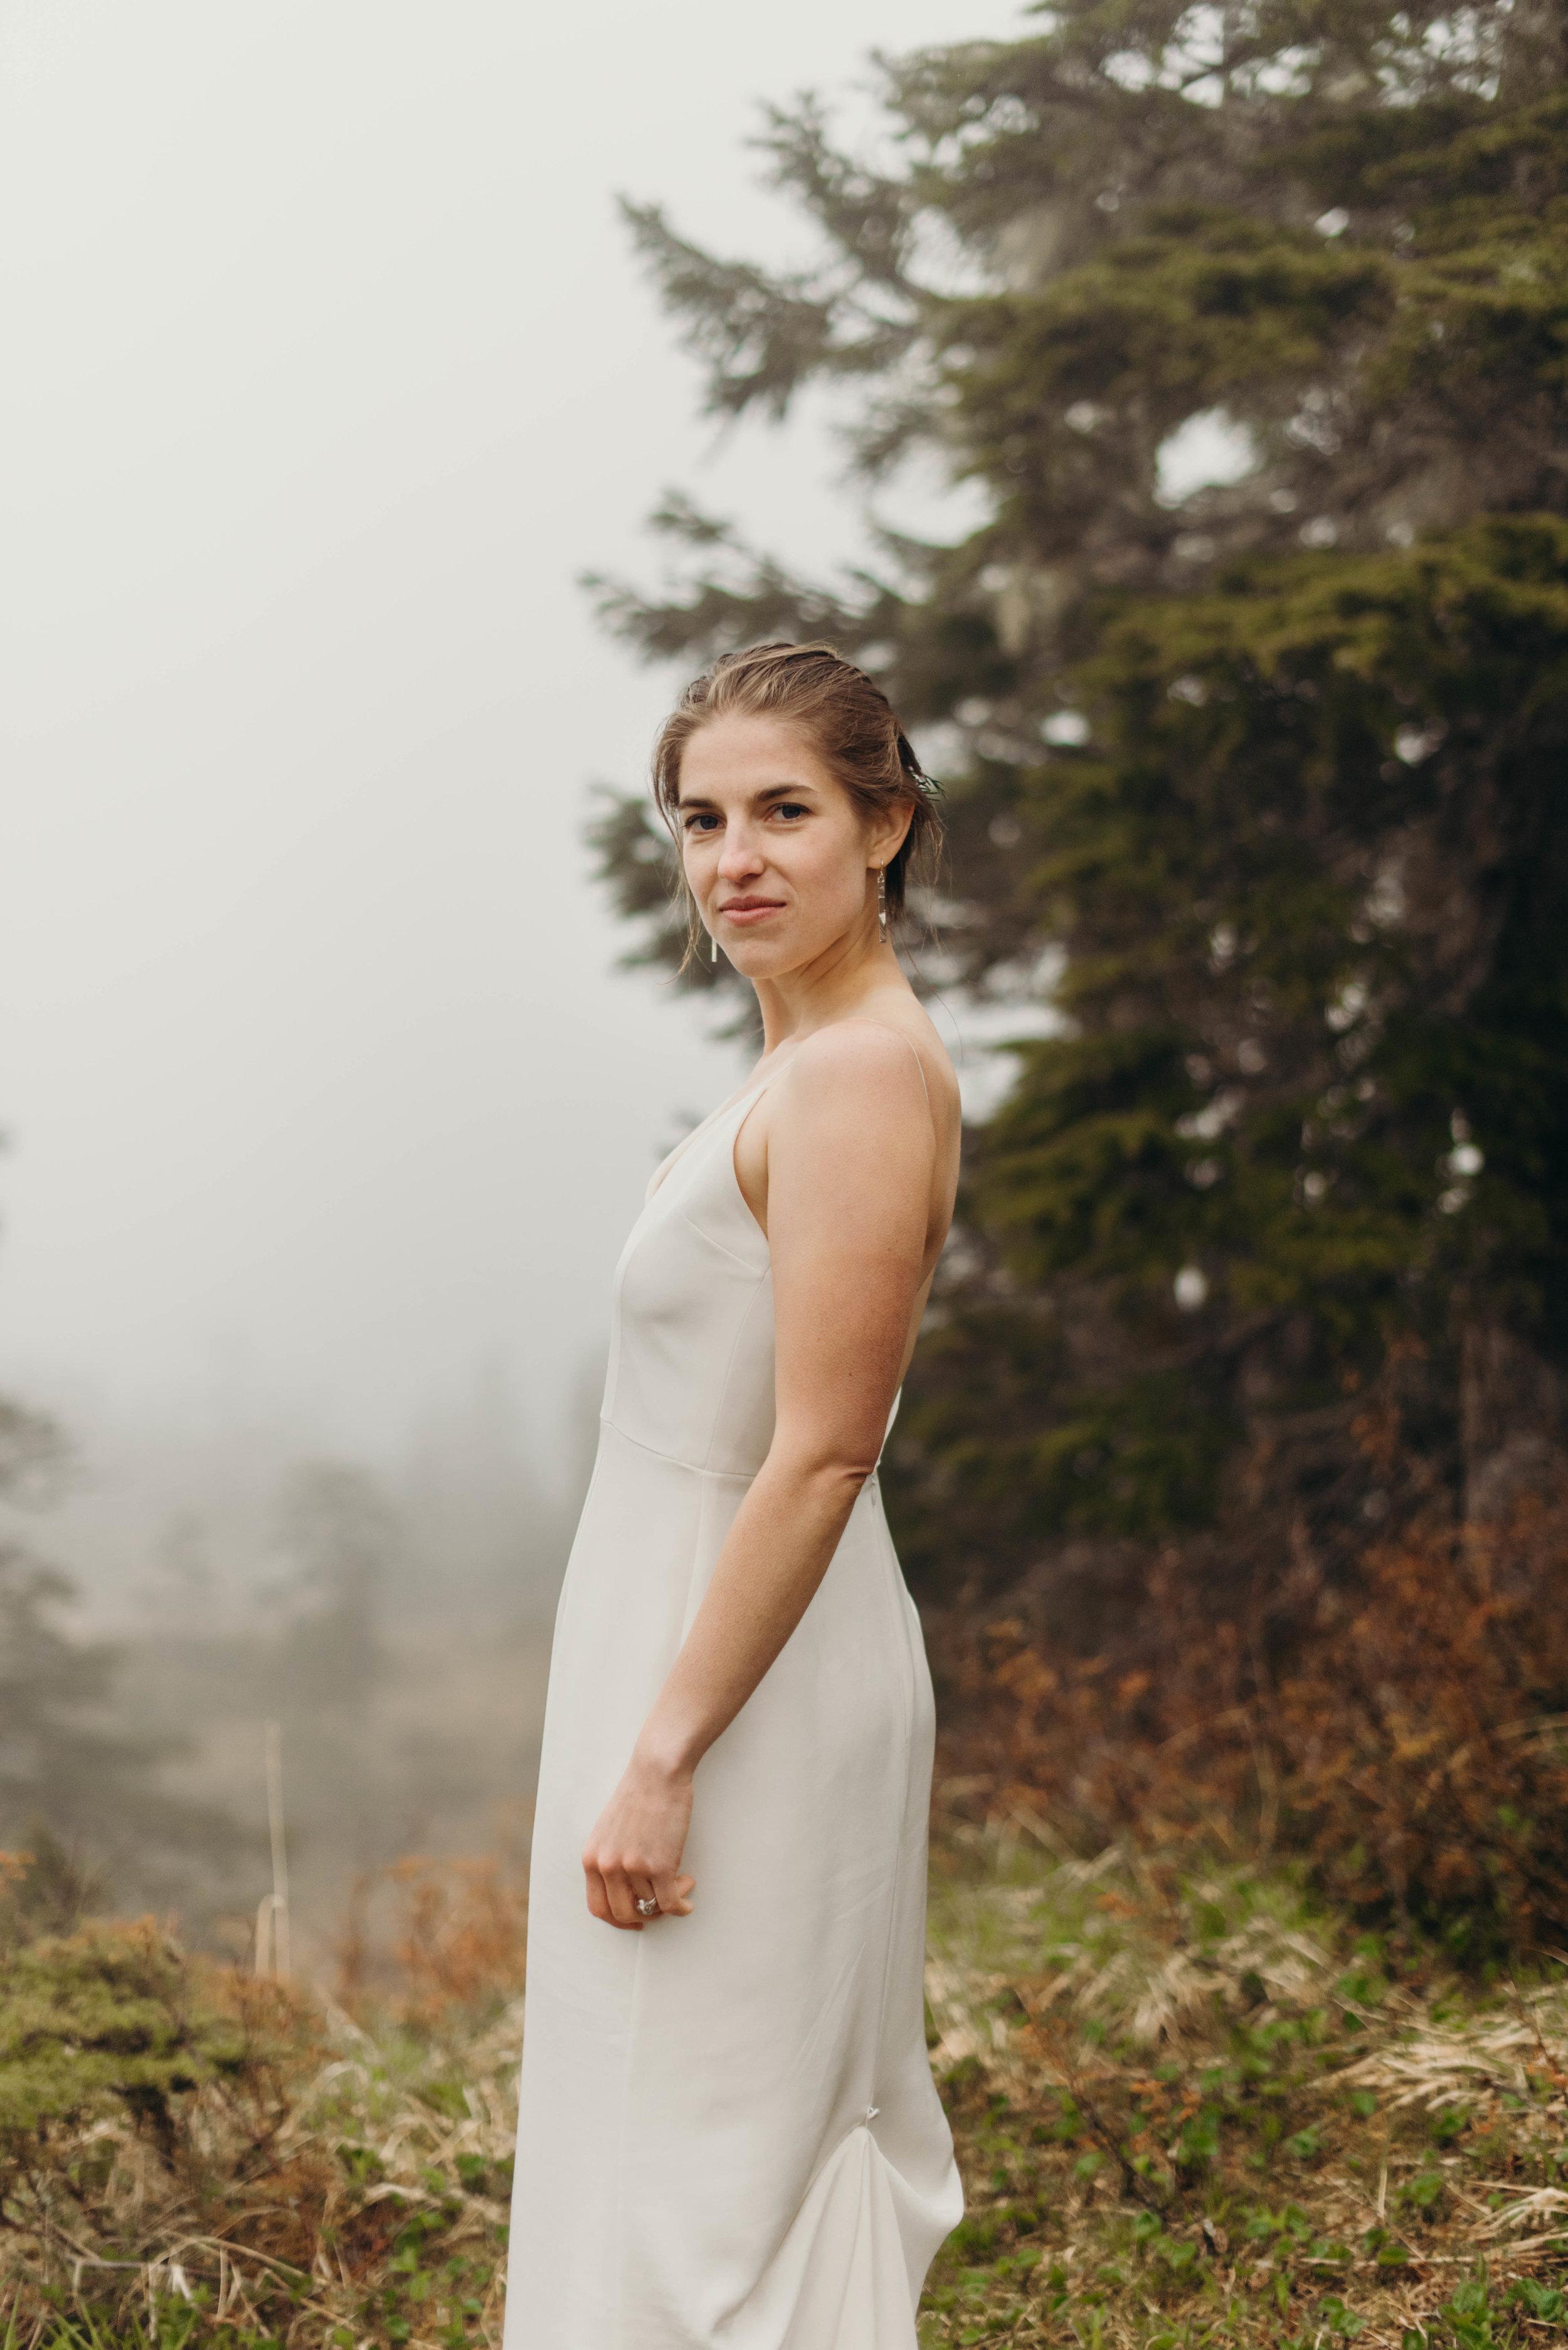 06 Misty Portraits-3264.jpg